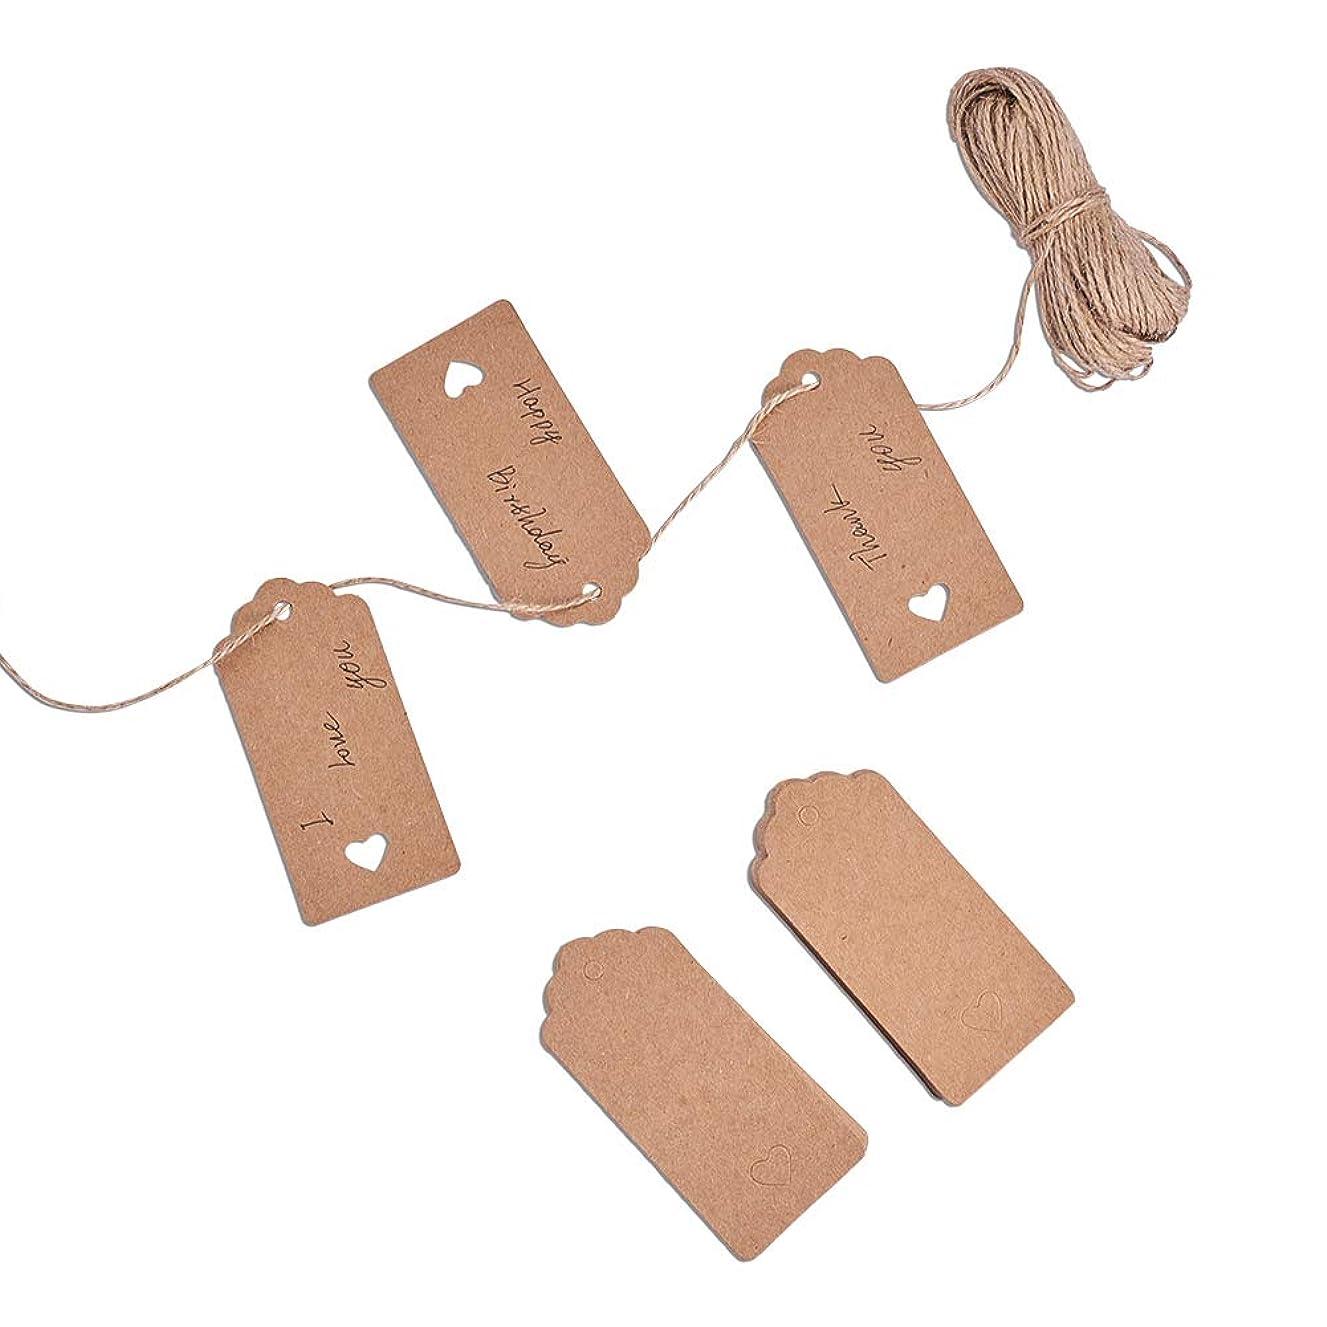 PH PandaHall 100PCS Brown Kraft Gift Tags Blank Paper Hang Tags Price Tags 65 Feet String Wedding Christmas Day Thanksgiving DIY Craft(95x45mm)